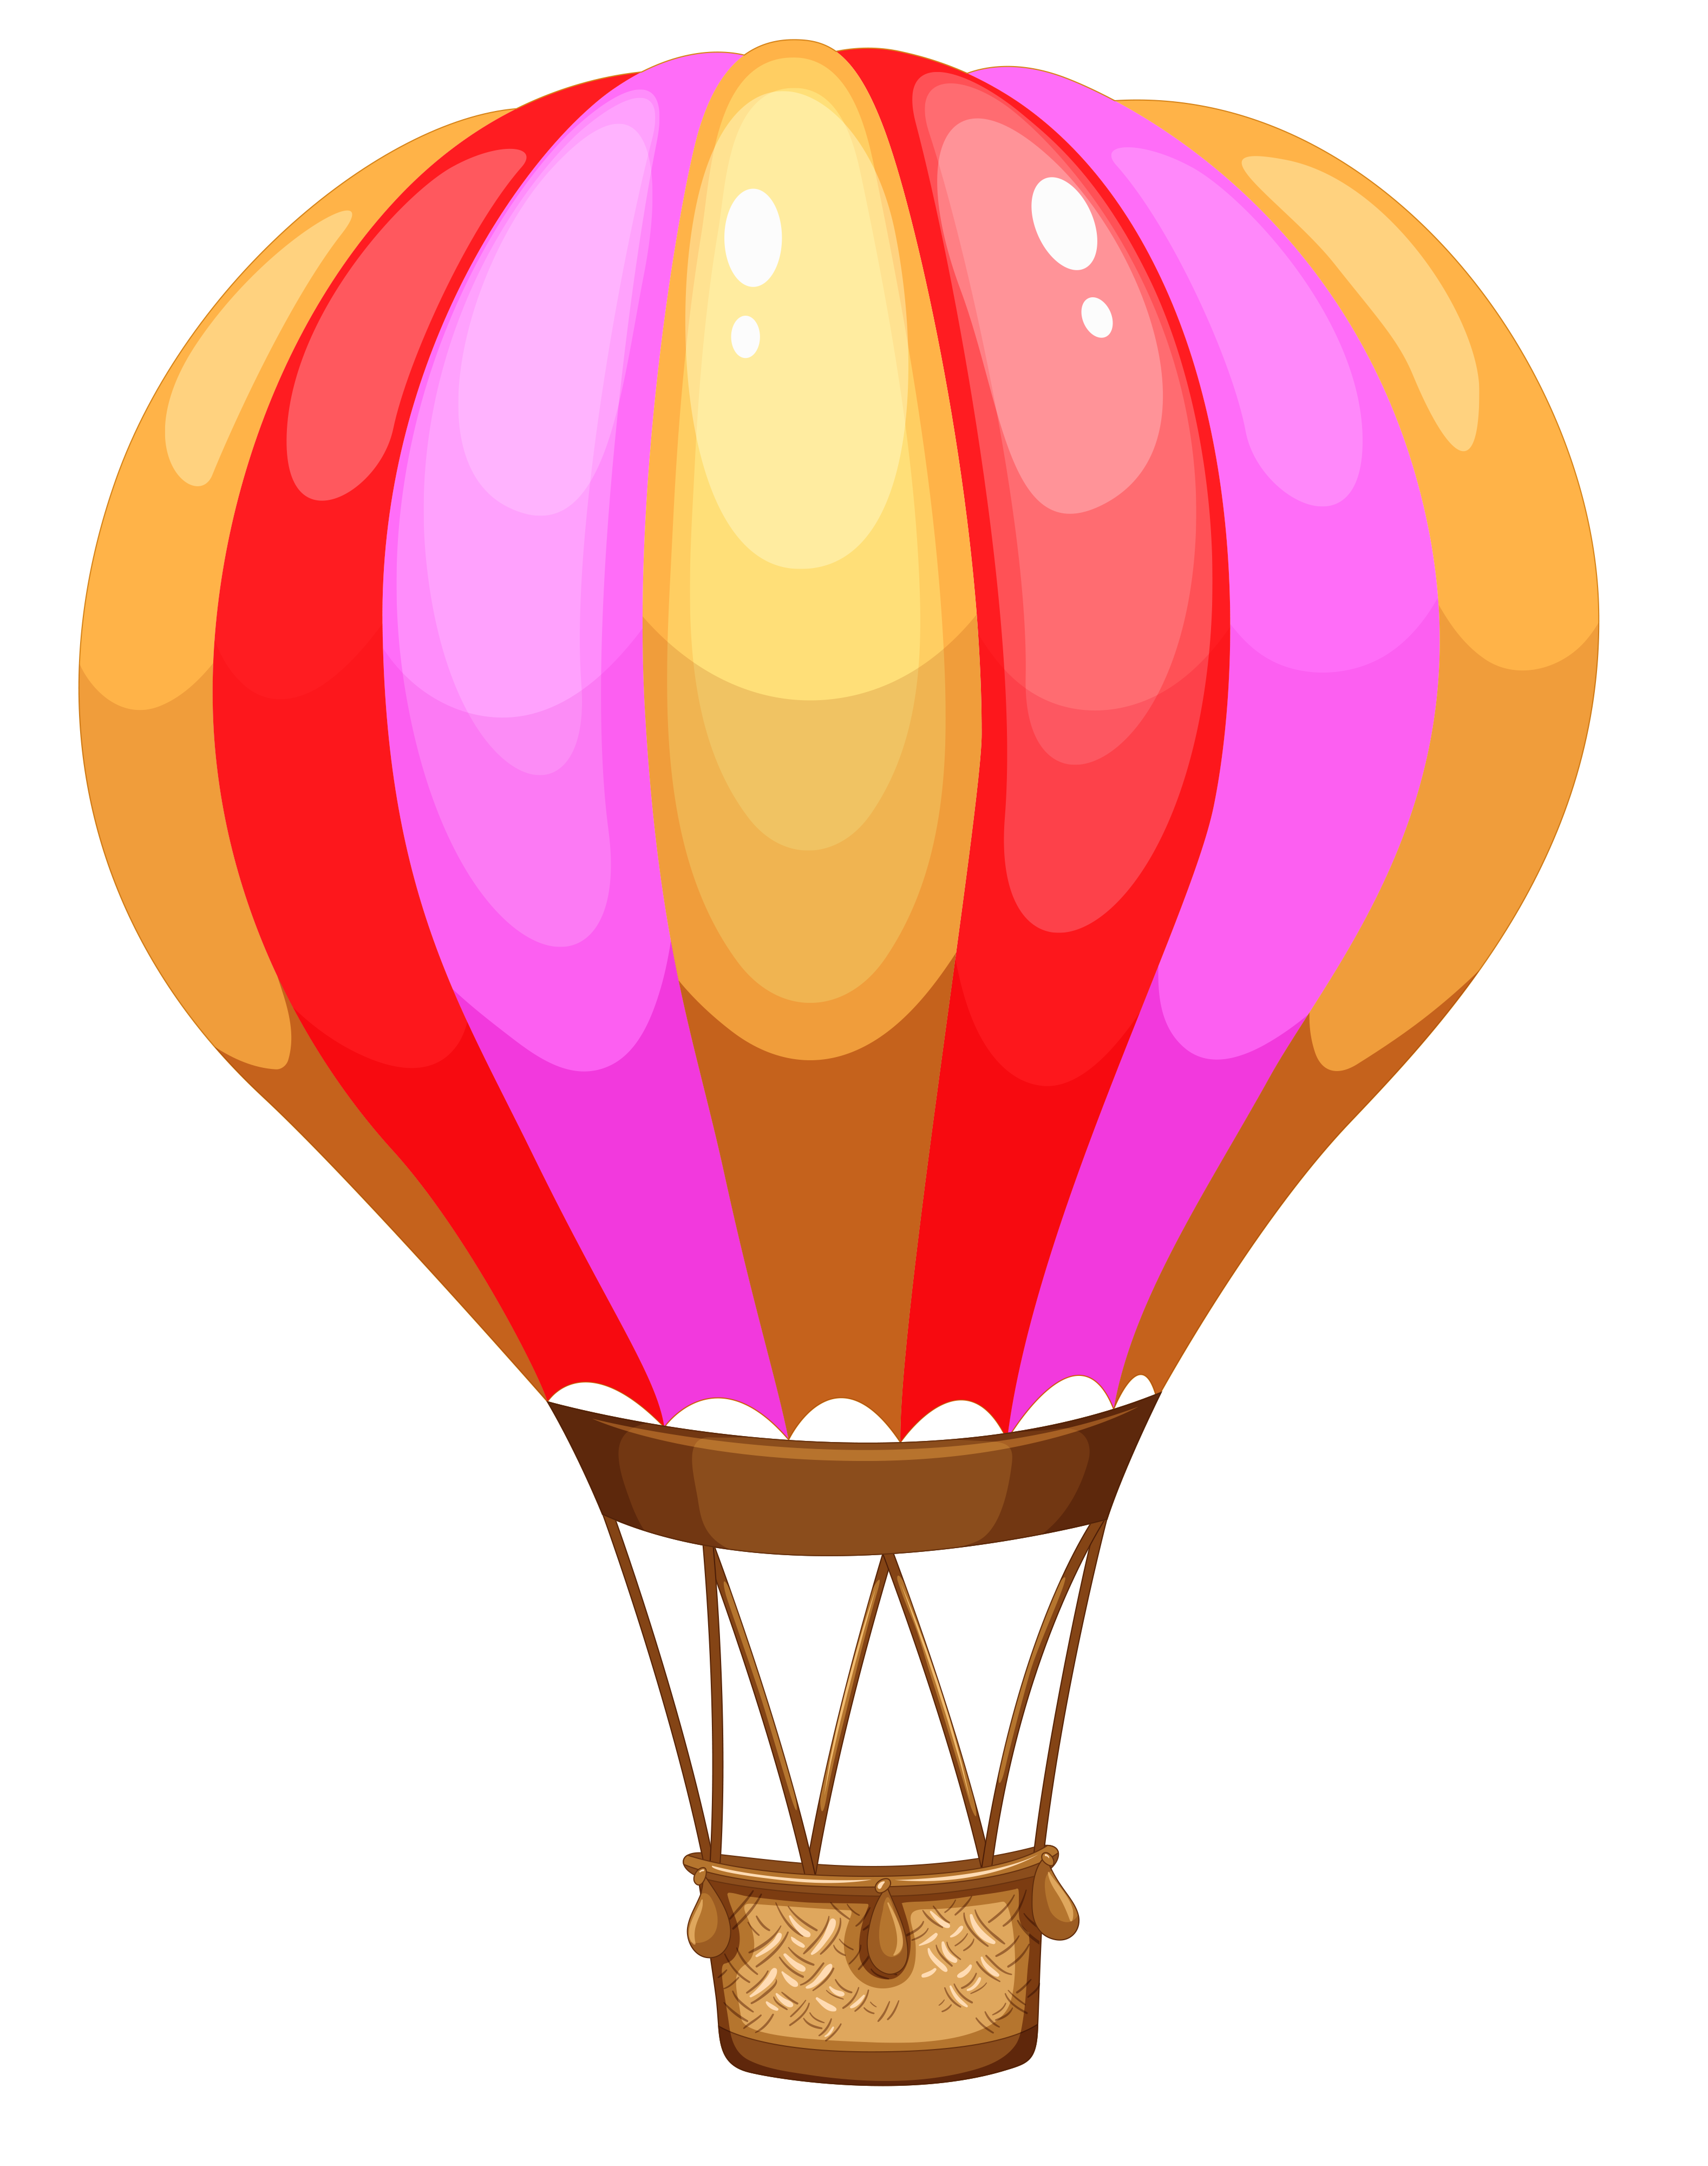 Pin By Eme Parola On Balon Hot Air Balloon Drawing Balloons Clip Art